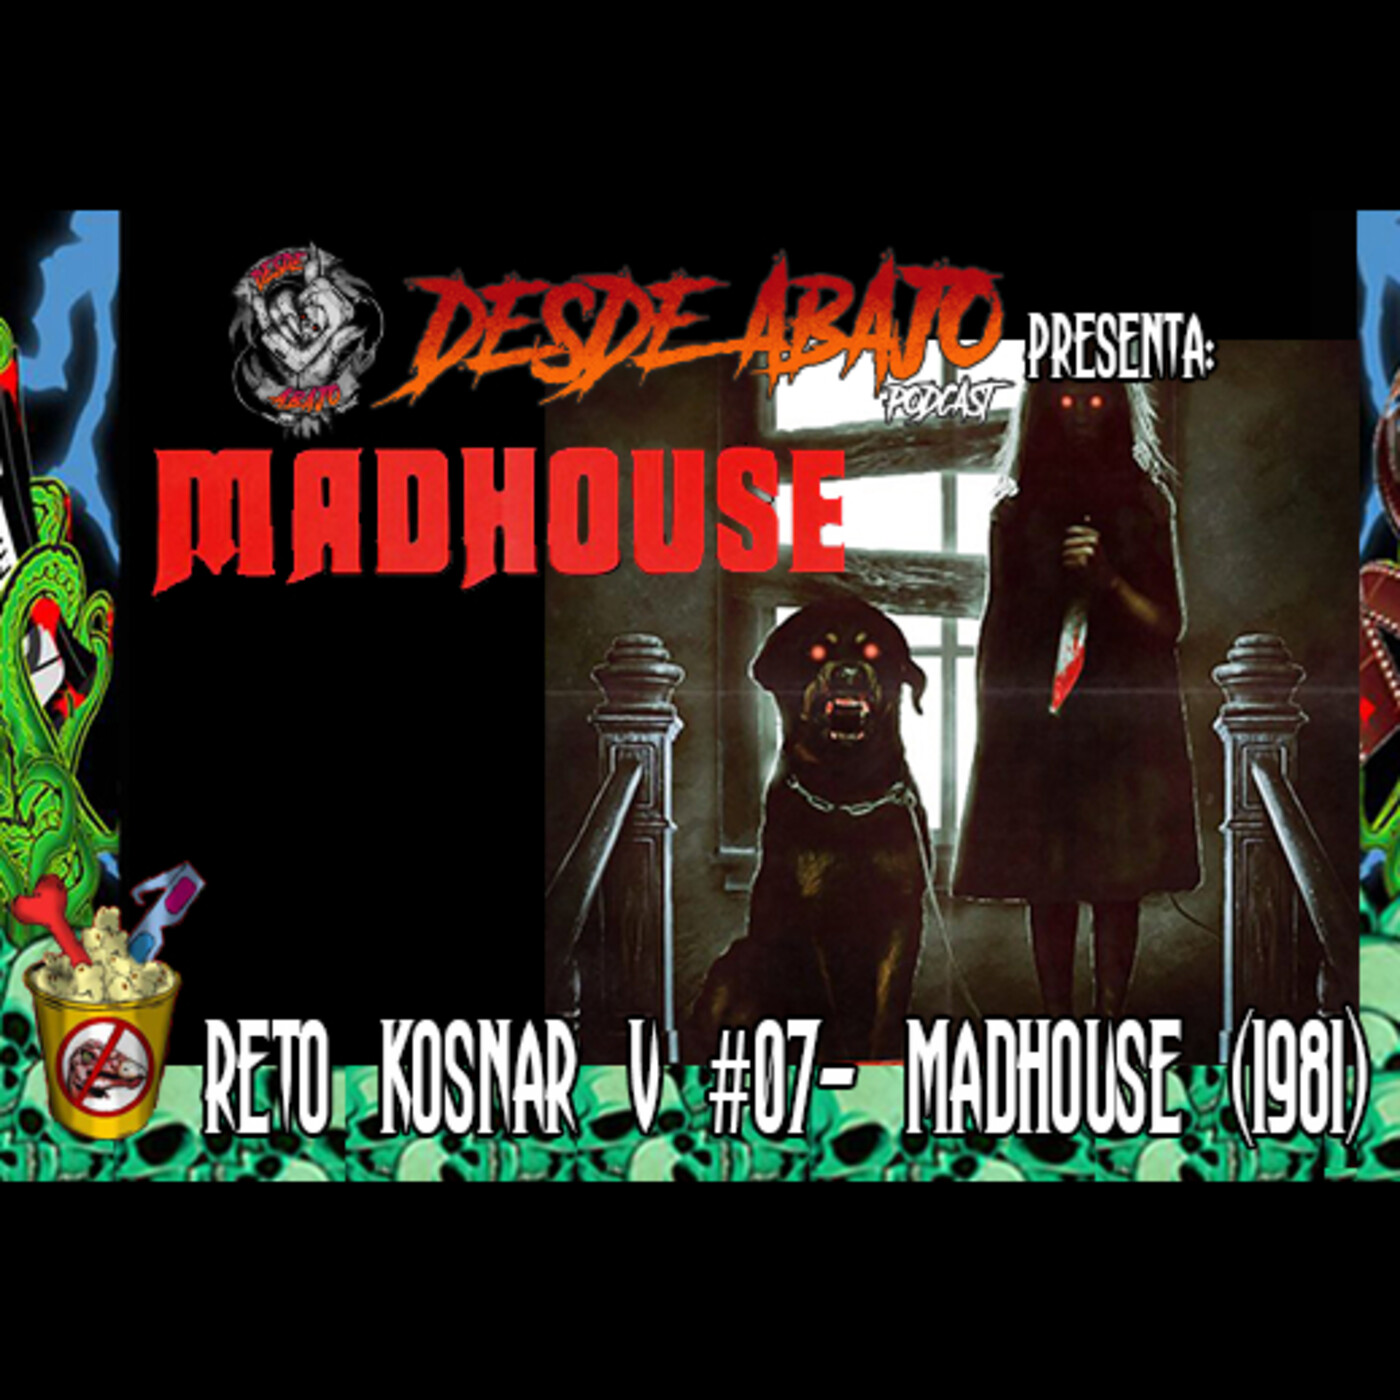 Reto Kosnar V #07- Madhouse (1981)